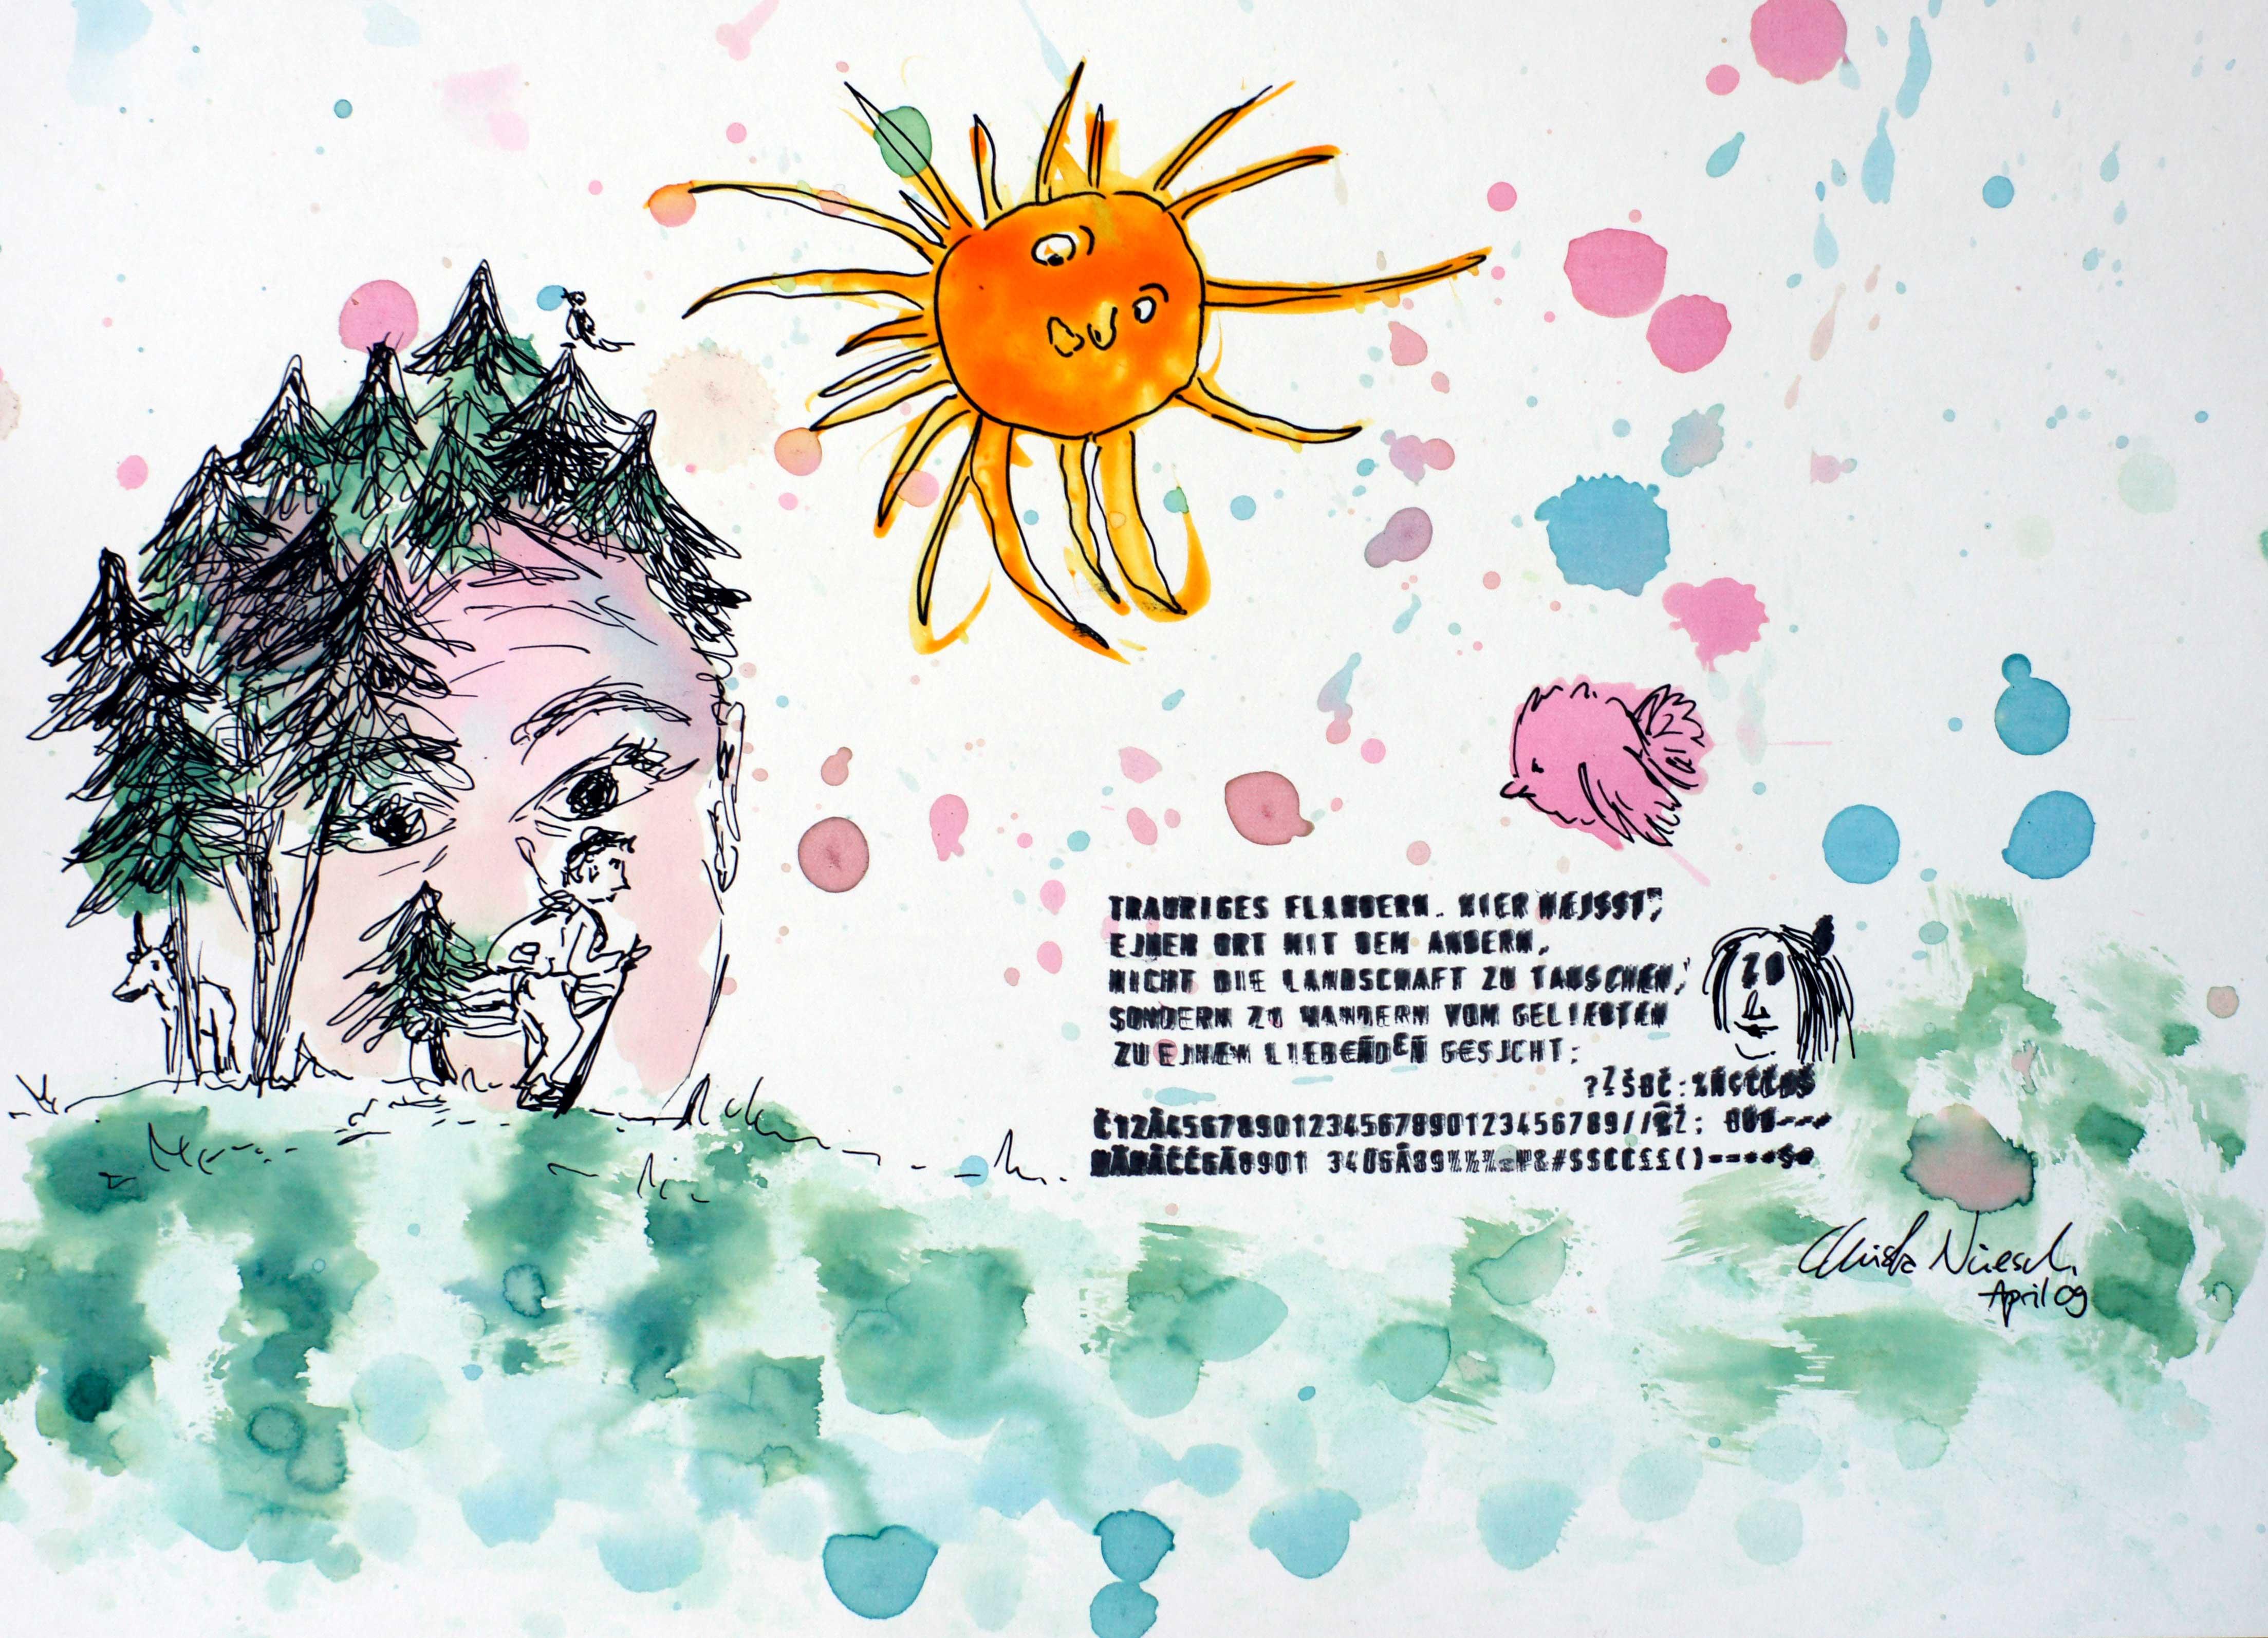 trauriges flandern, illustration Christa Nüesch